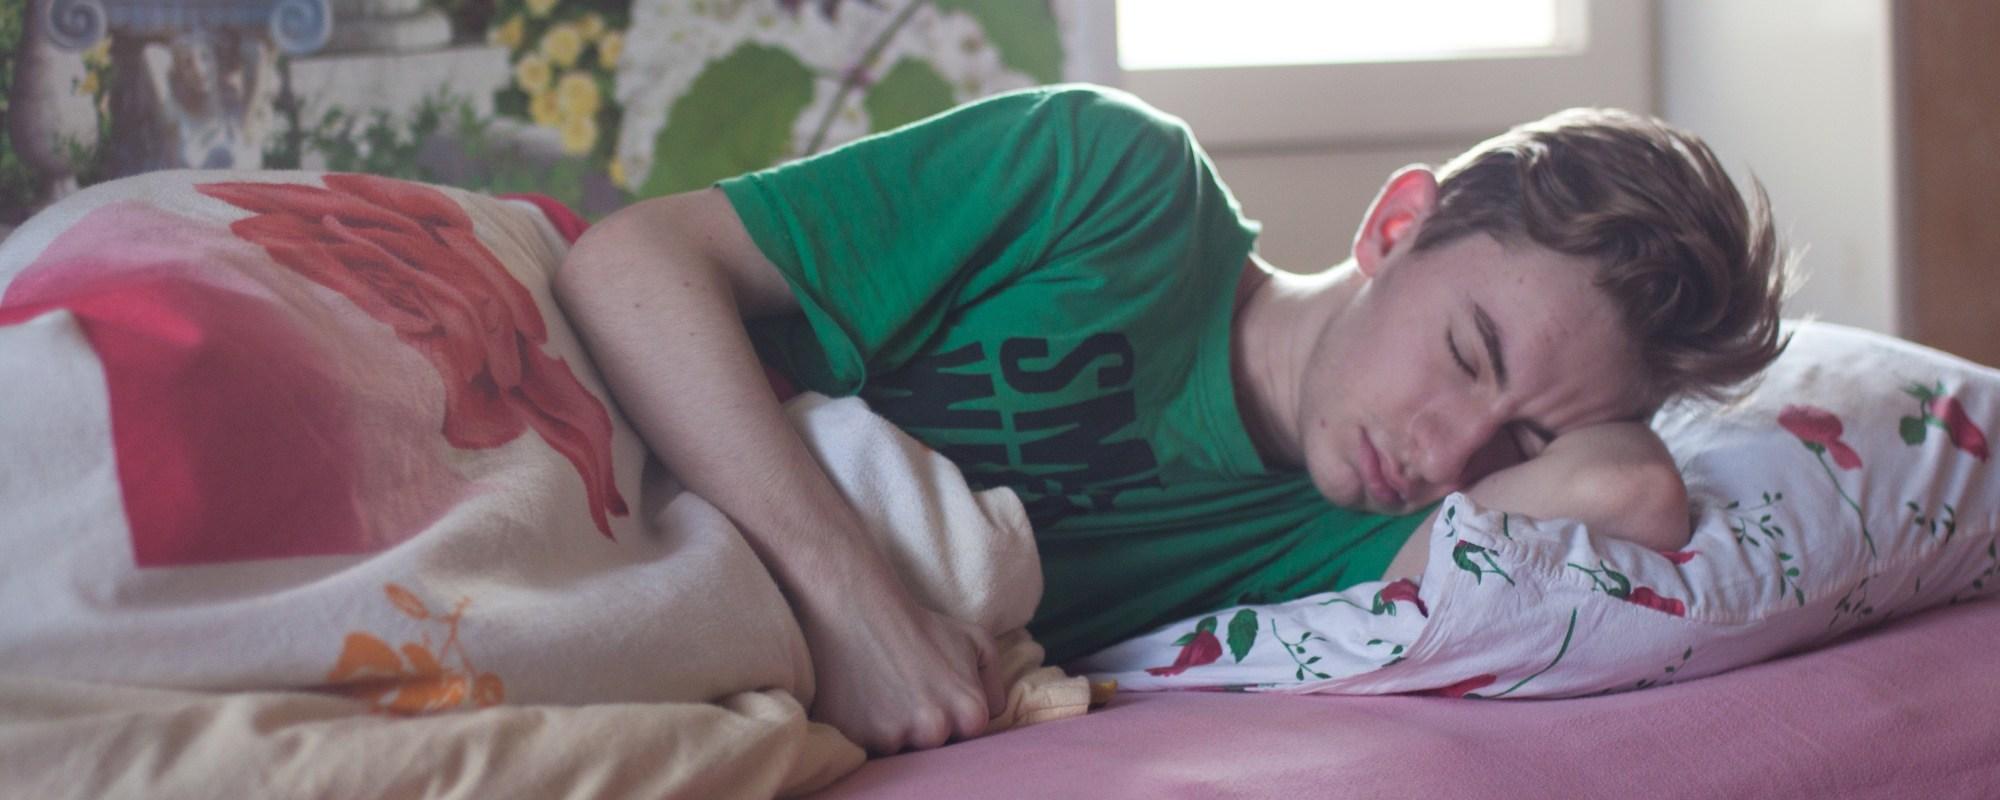 Sleep on side - Snoring Remedies